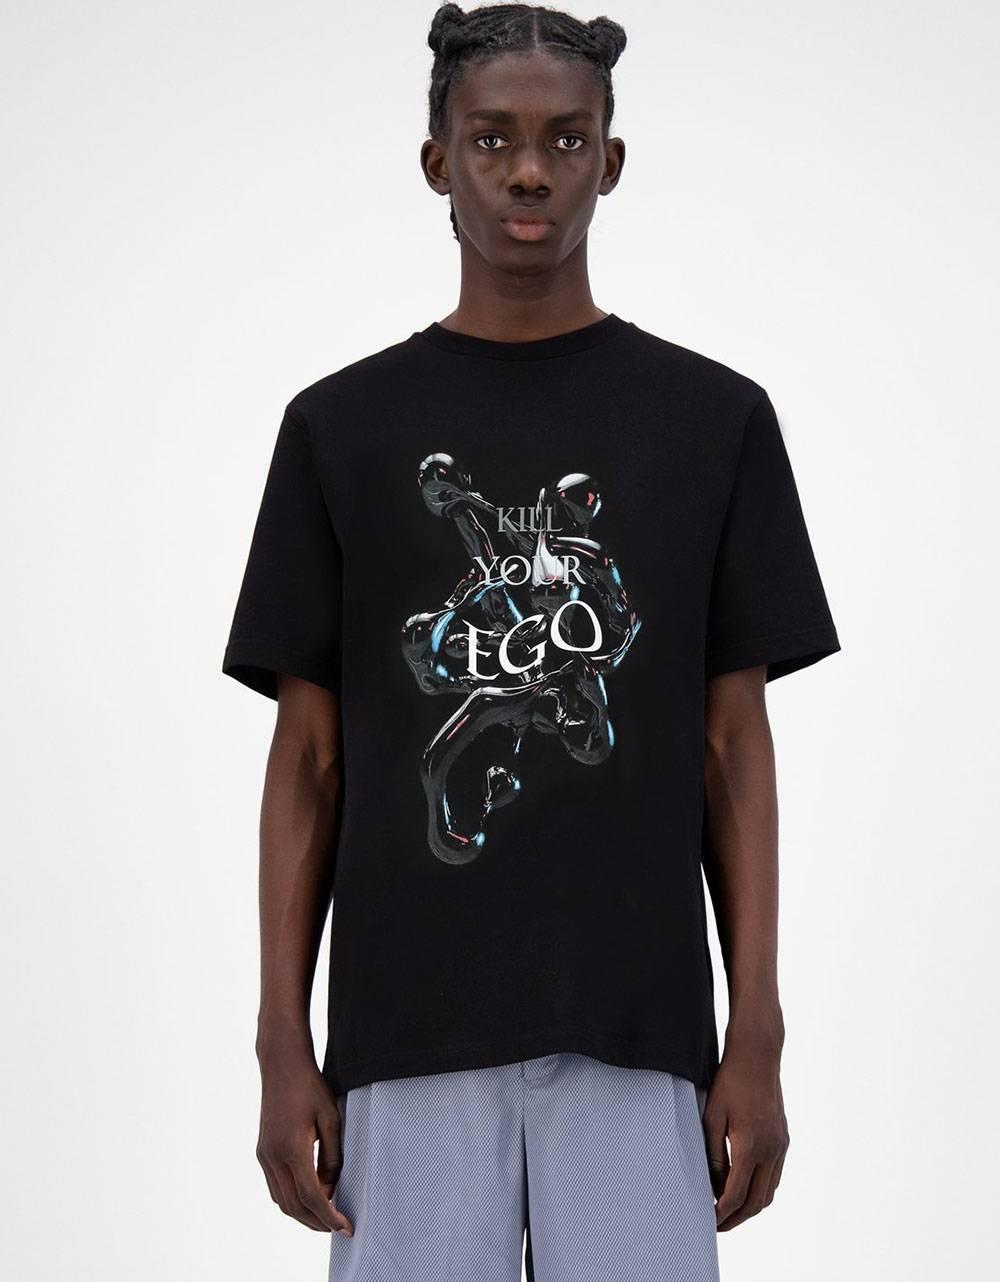 Daily Paper Jenbla t-shirt - black DAILY PAPER T-shirt 53,28€